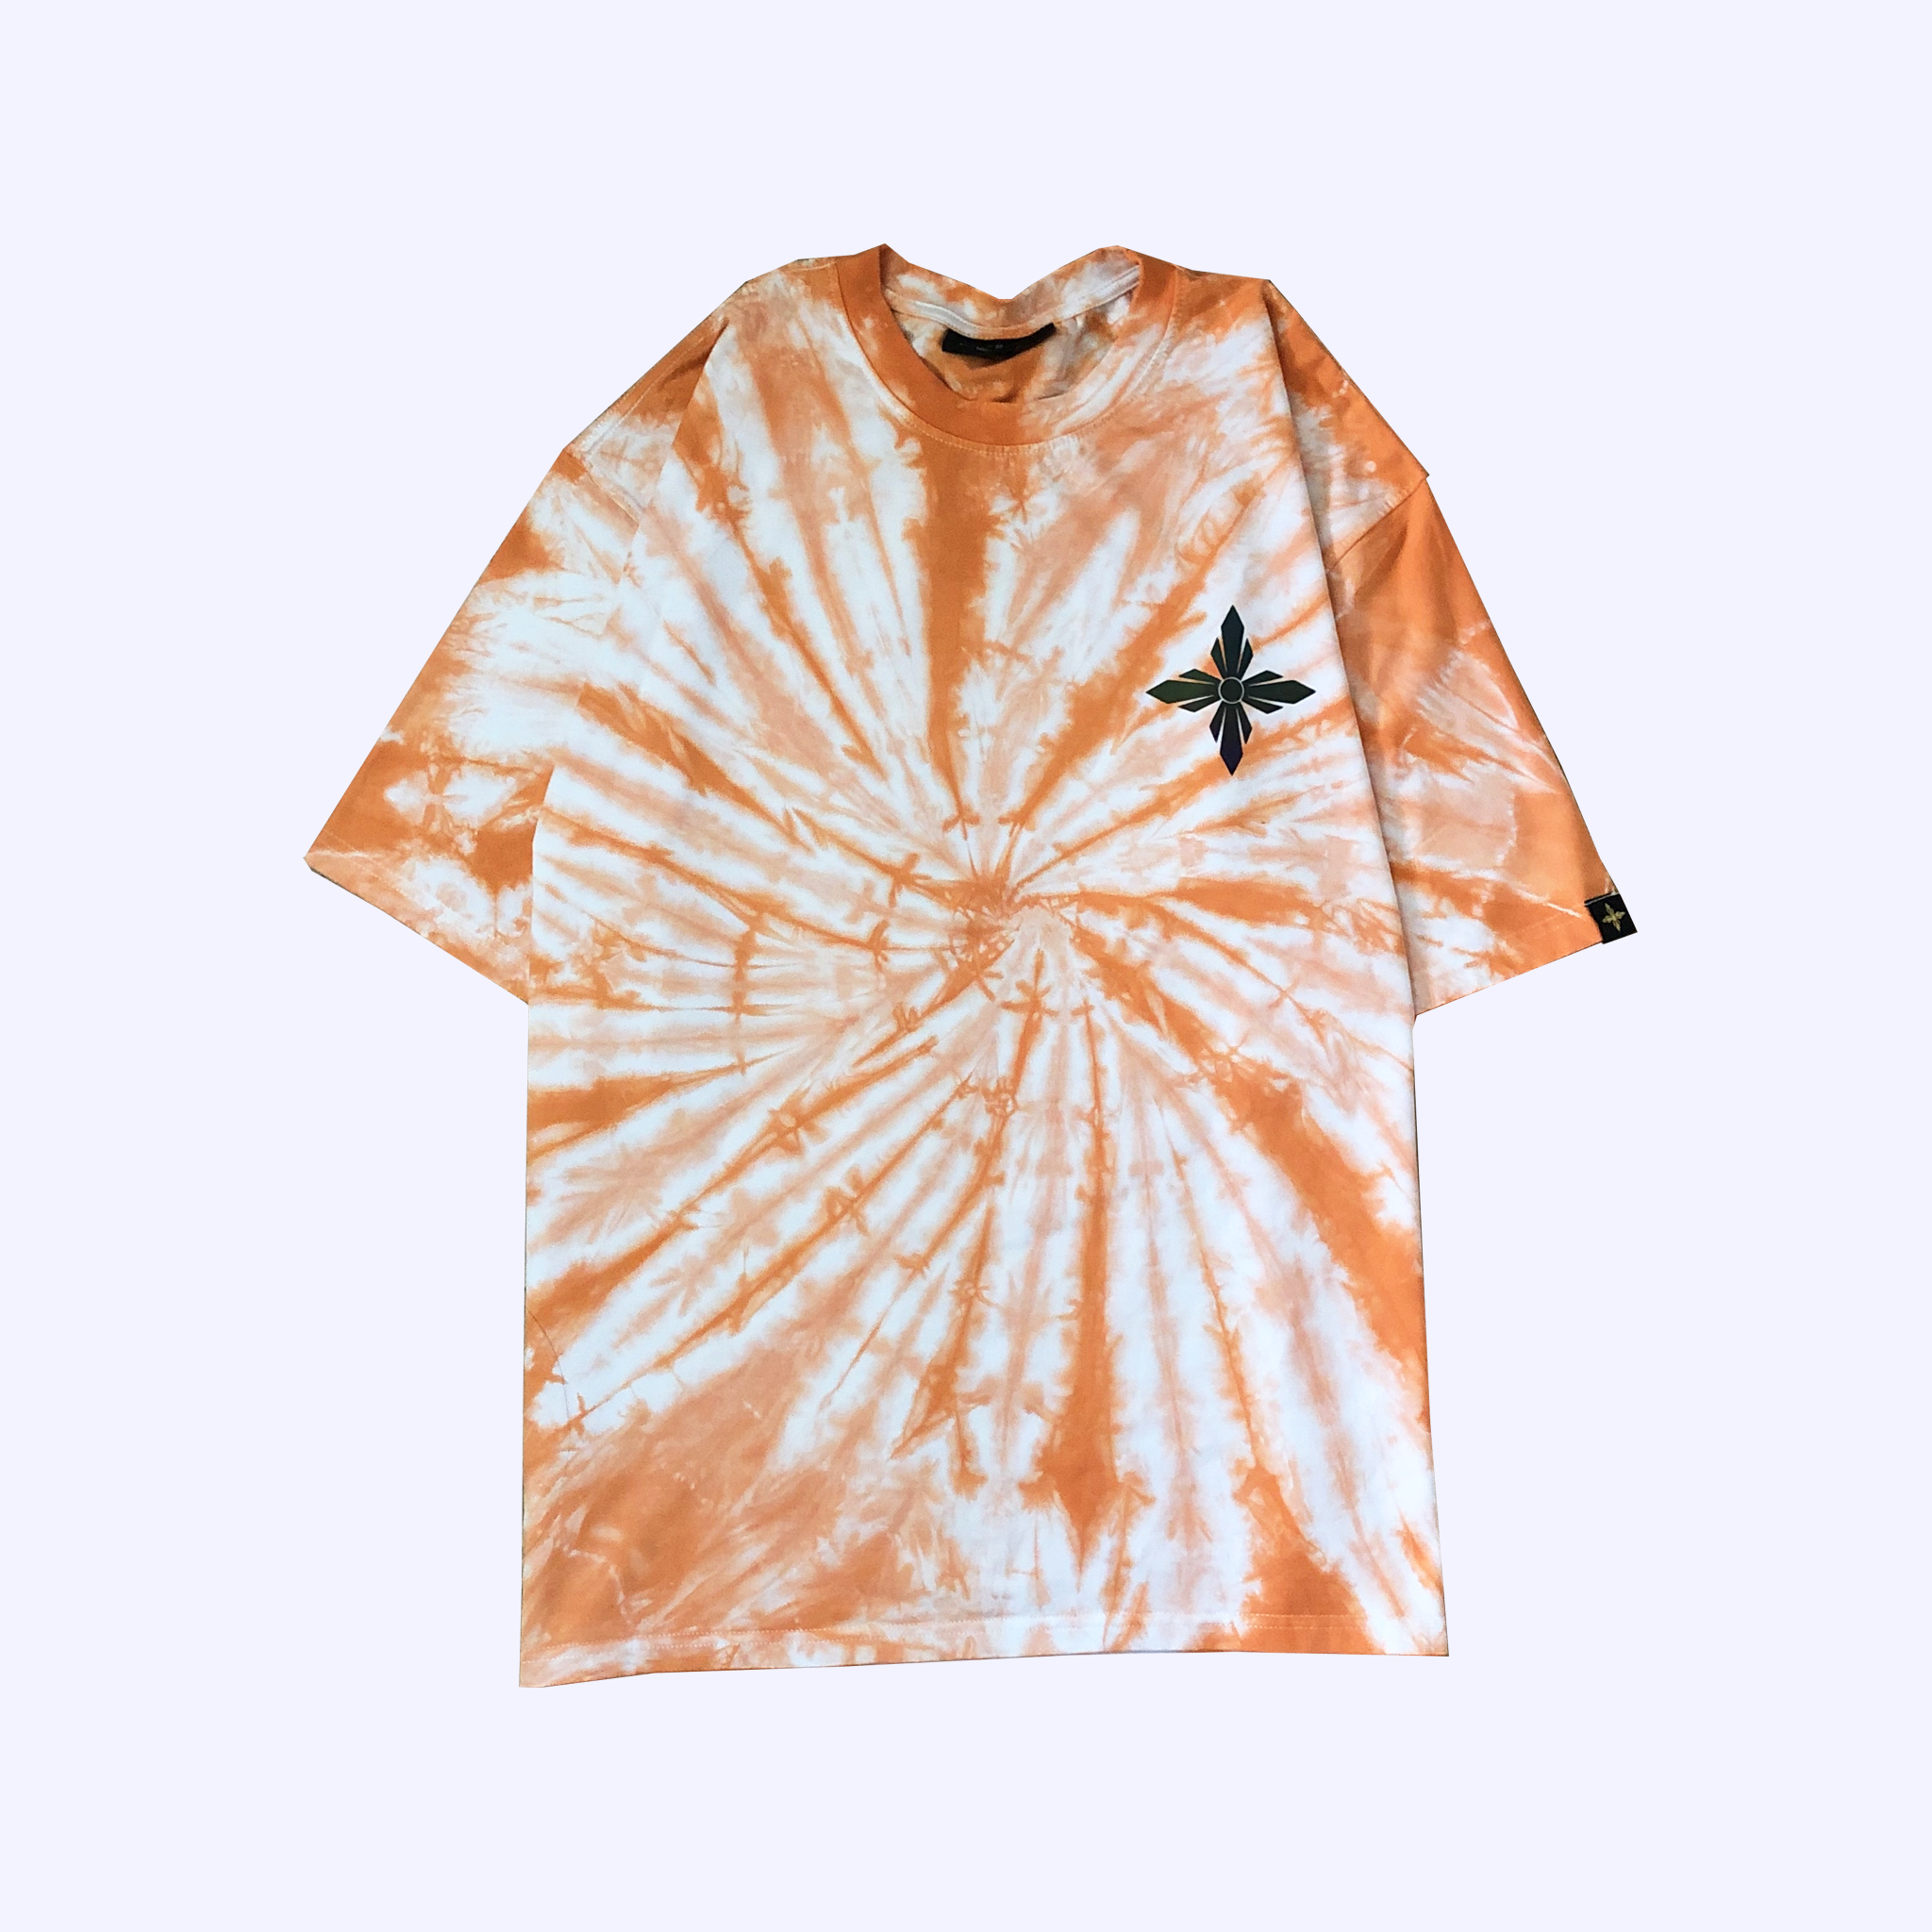 Hologram Brilliant Mars T-Shirt